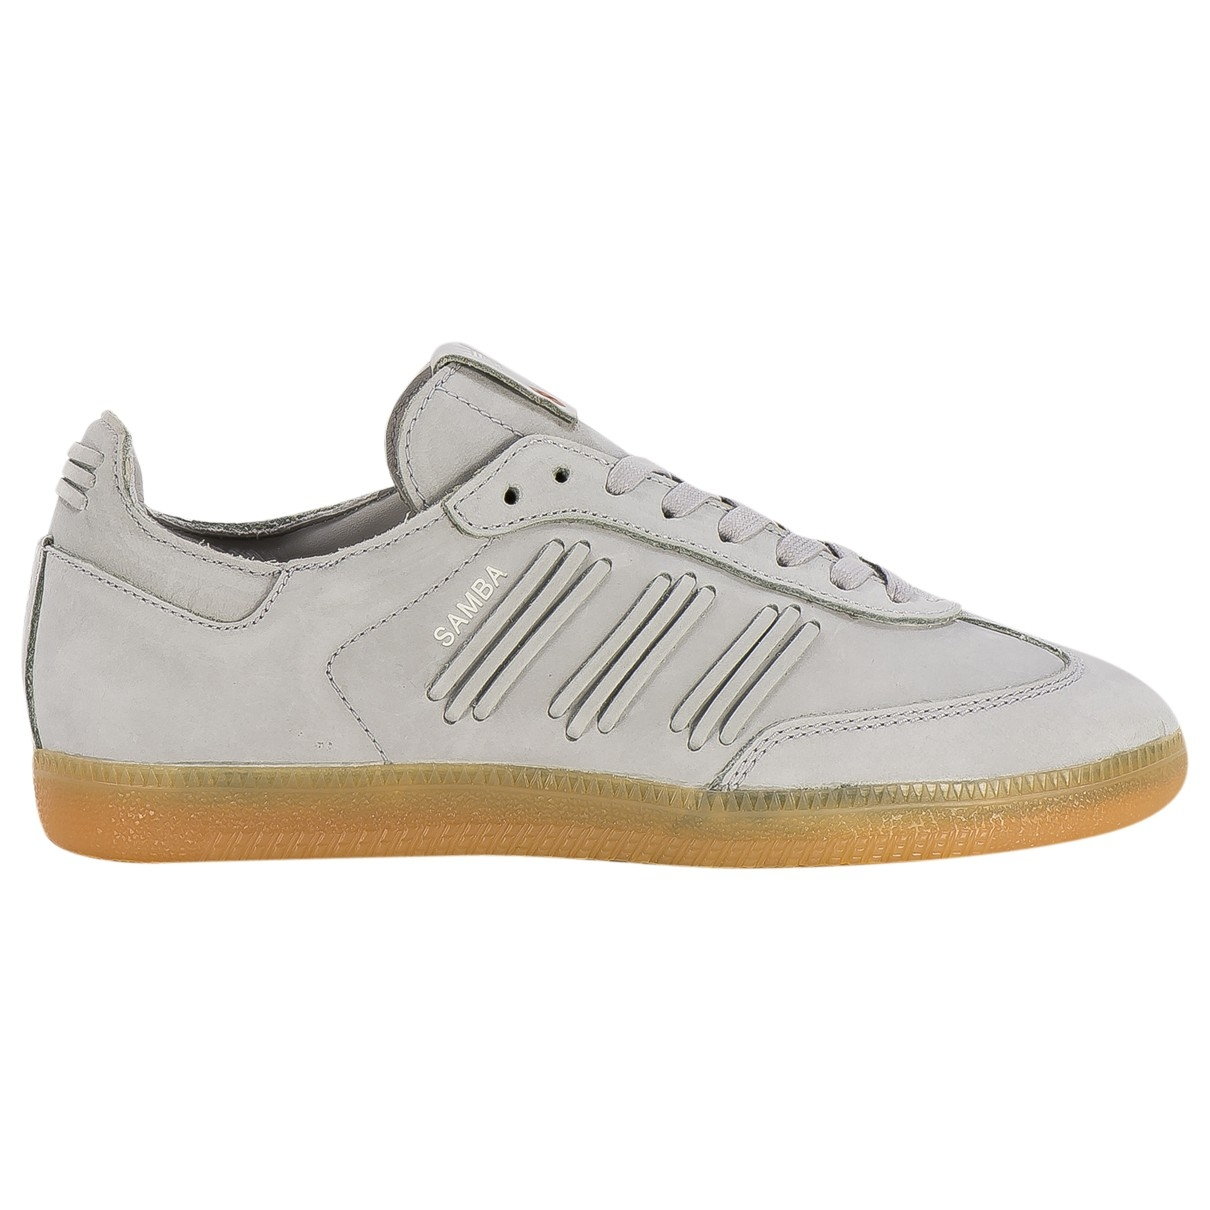 Adidas Samba Grey Leather Trainers for Women 40 EU